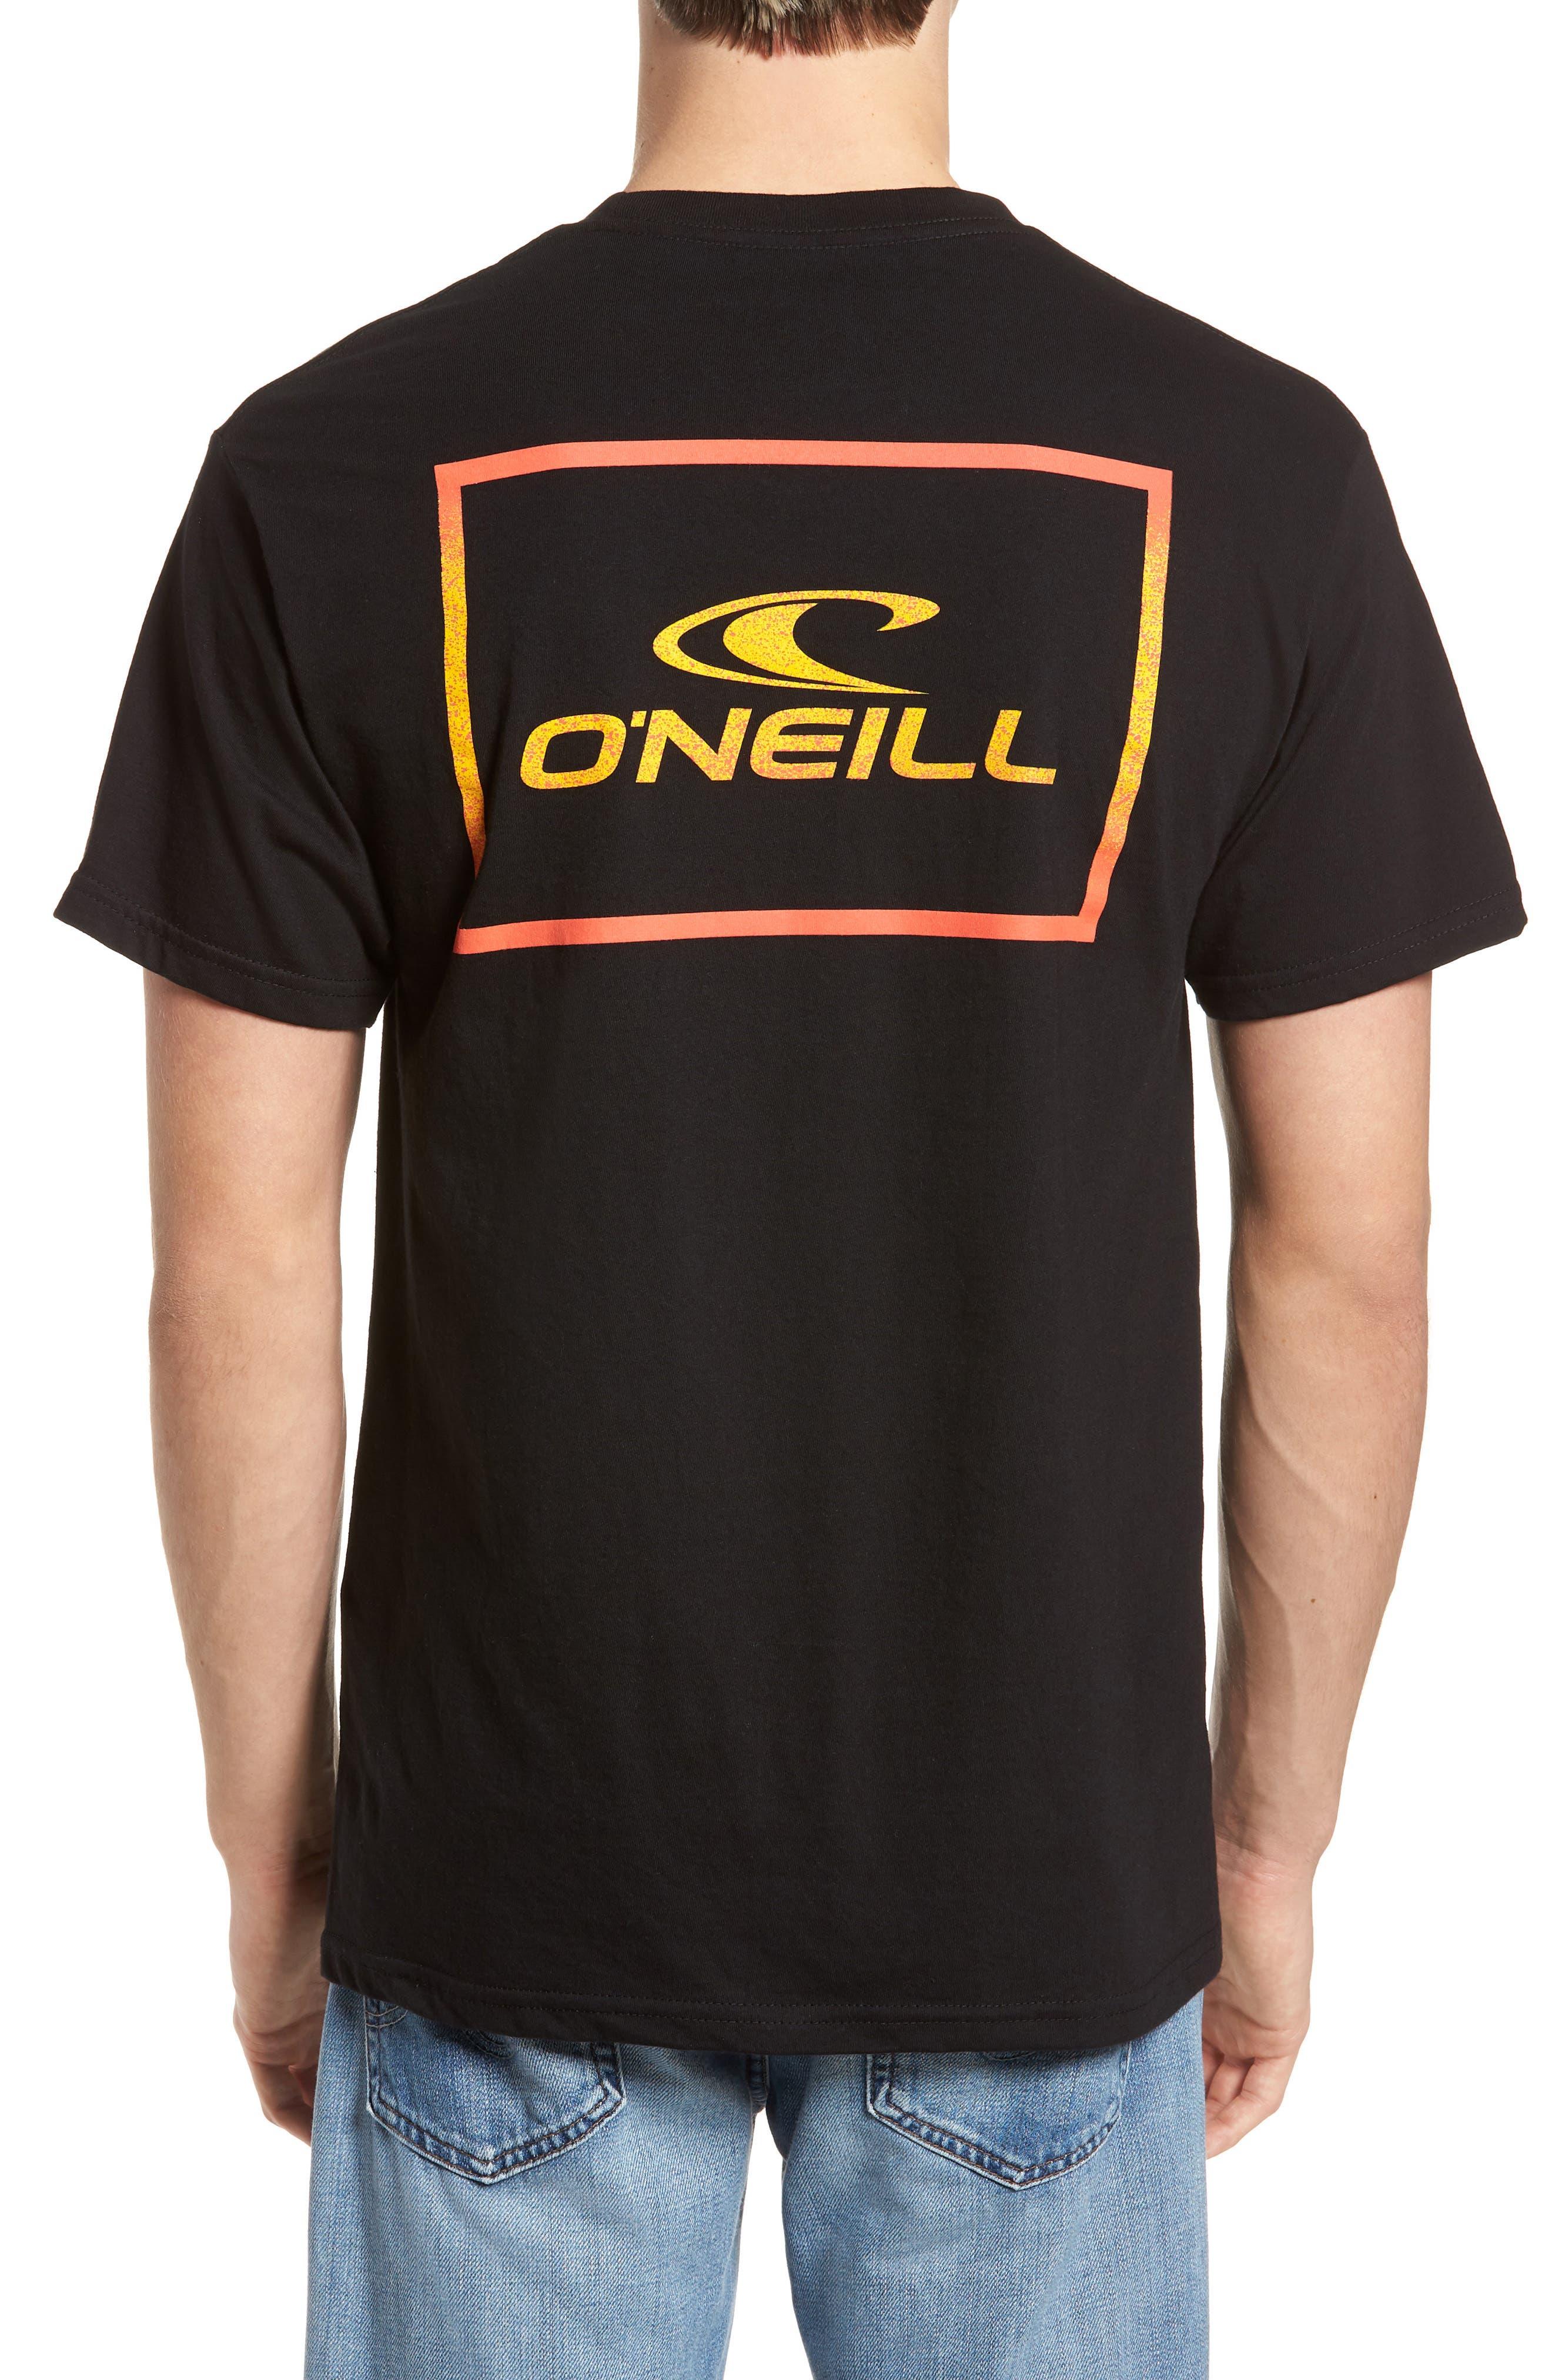 Square Root Graphic T-Shirt,                             Alternate thumbnail 2, color,                             Black